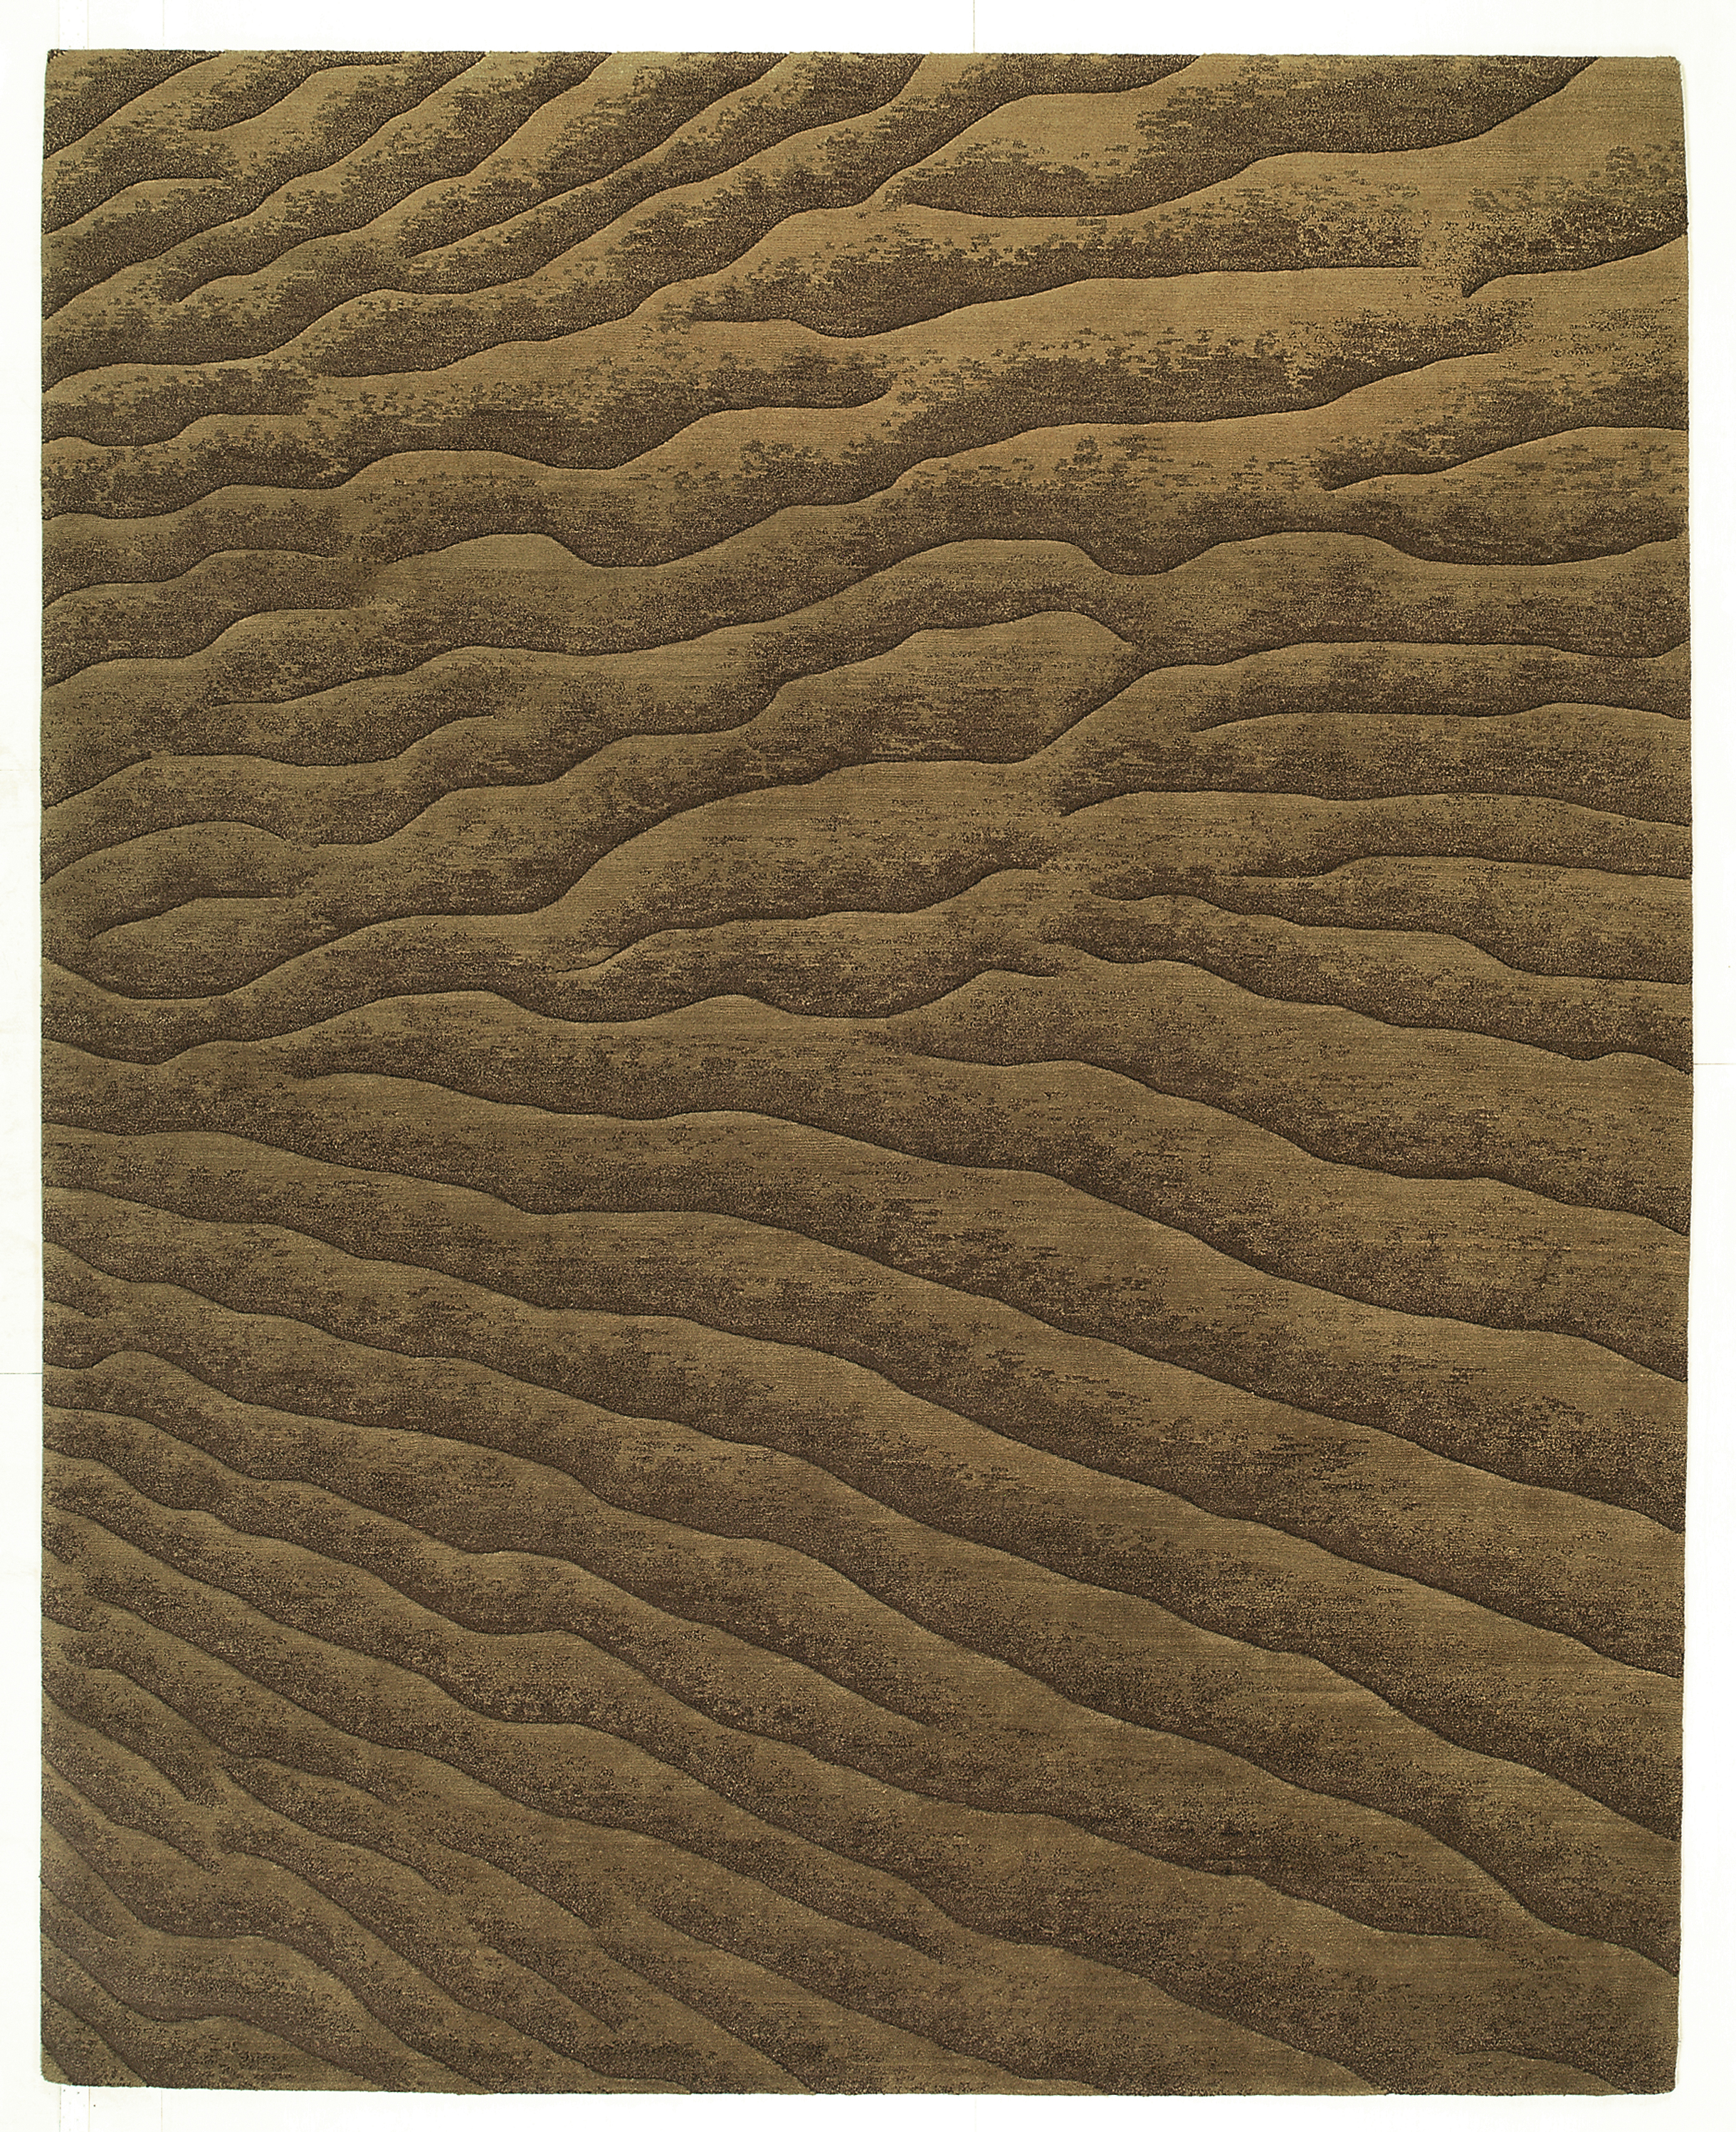 Dunes-Acorn_HR_007.jpg